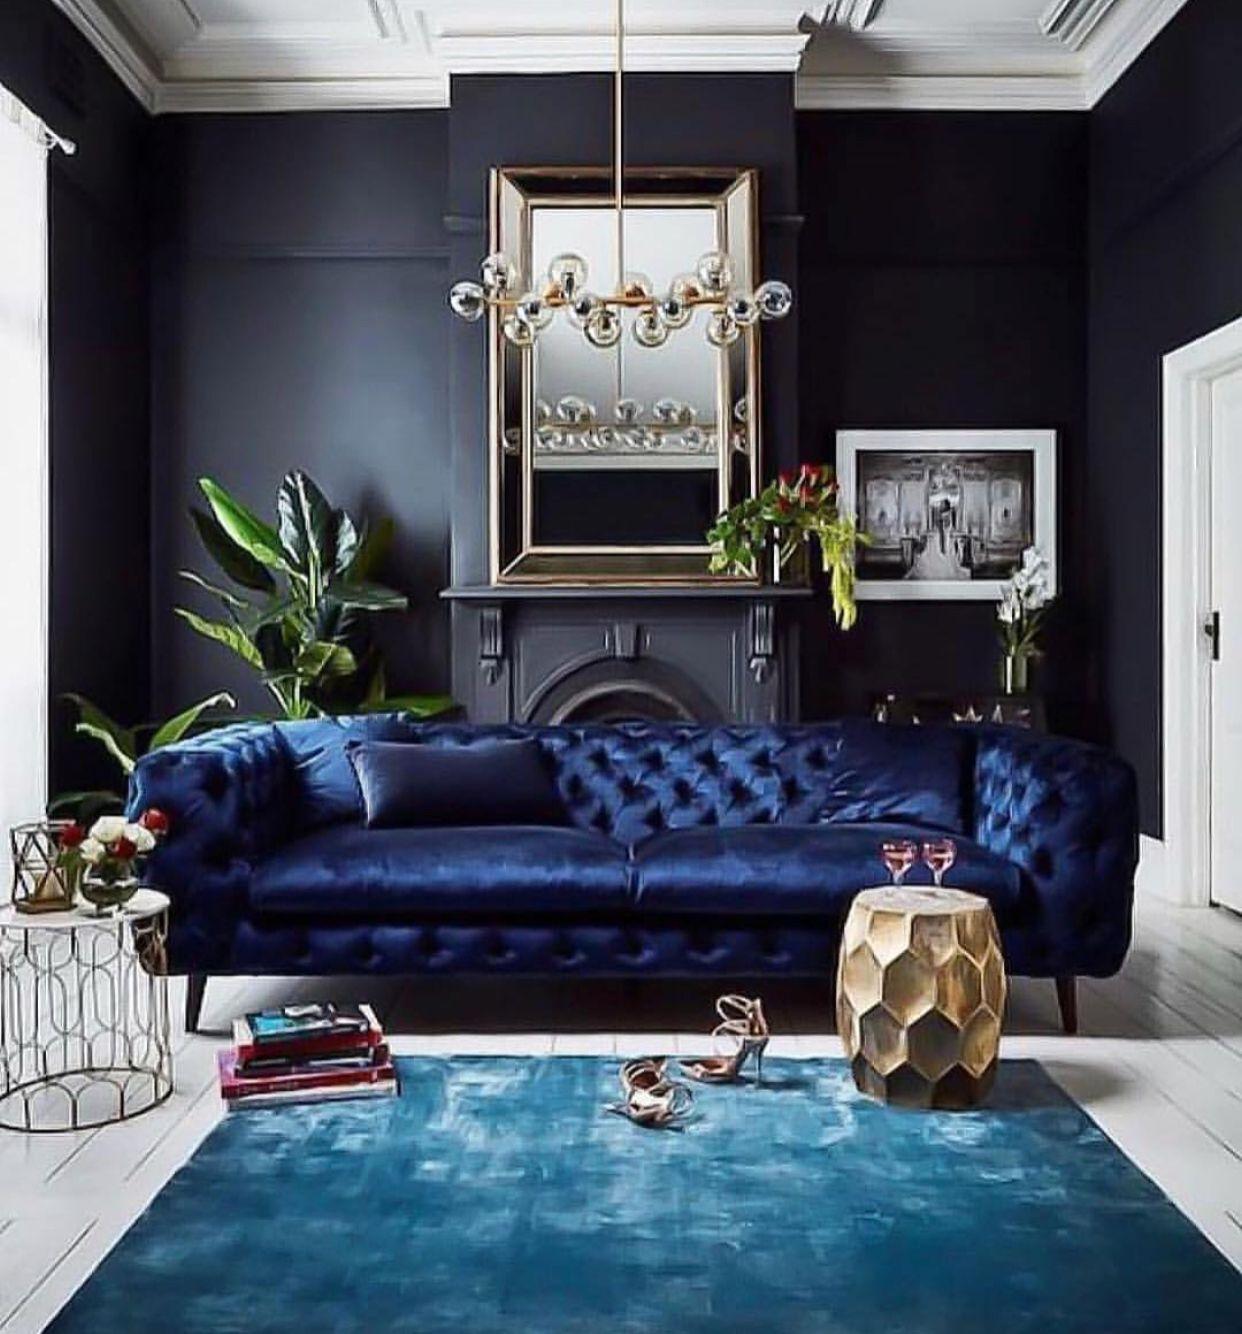 Living Room Modern Black: Pin By DINA DEVINE On Boho Best